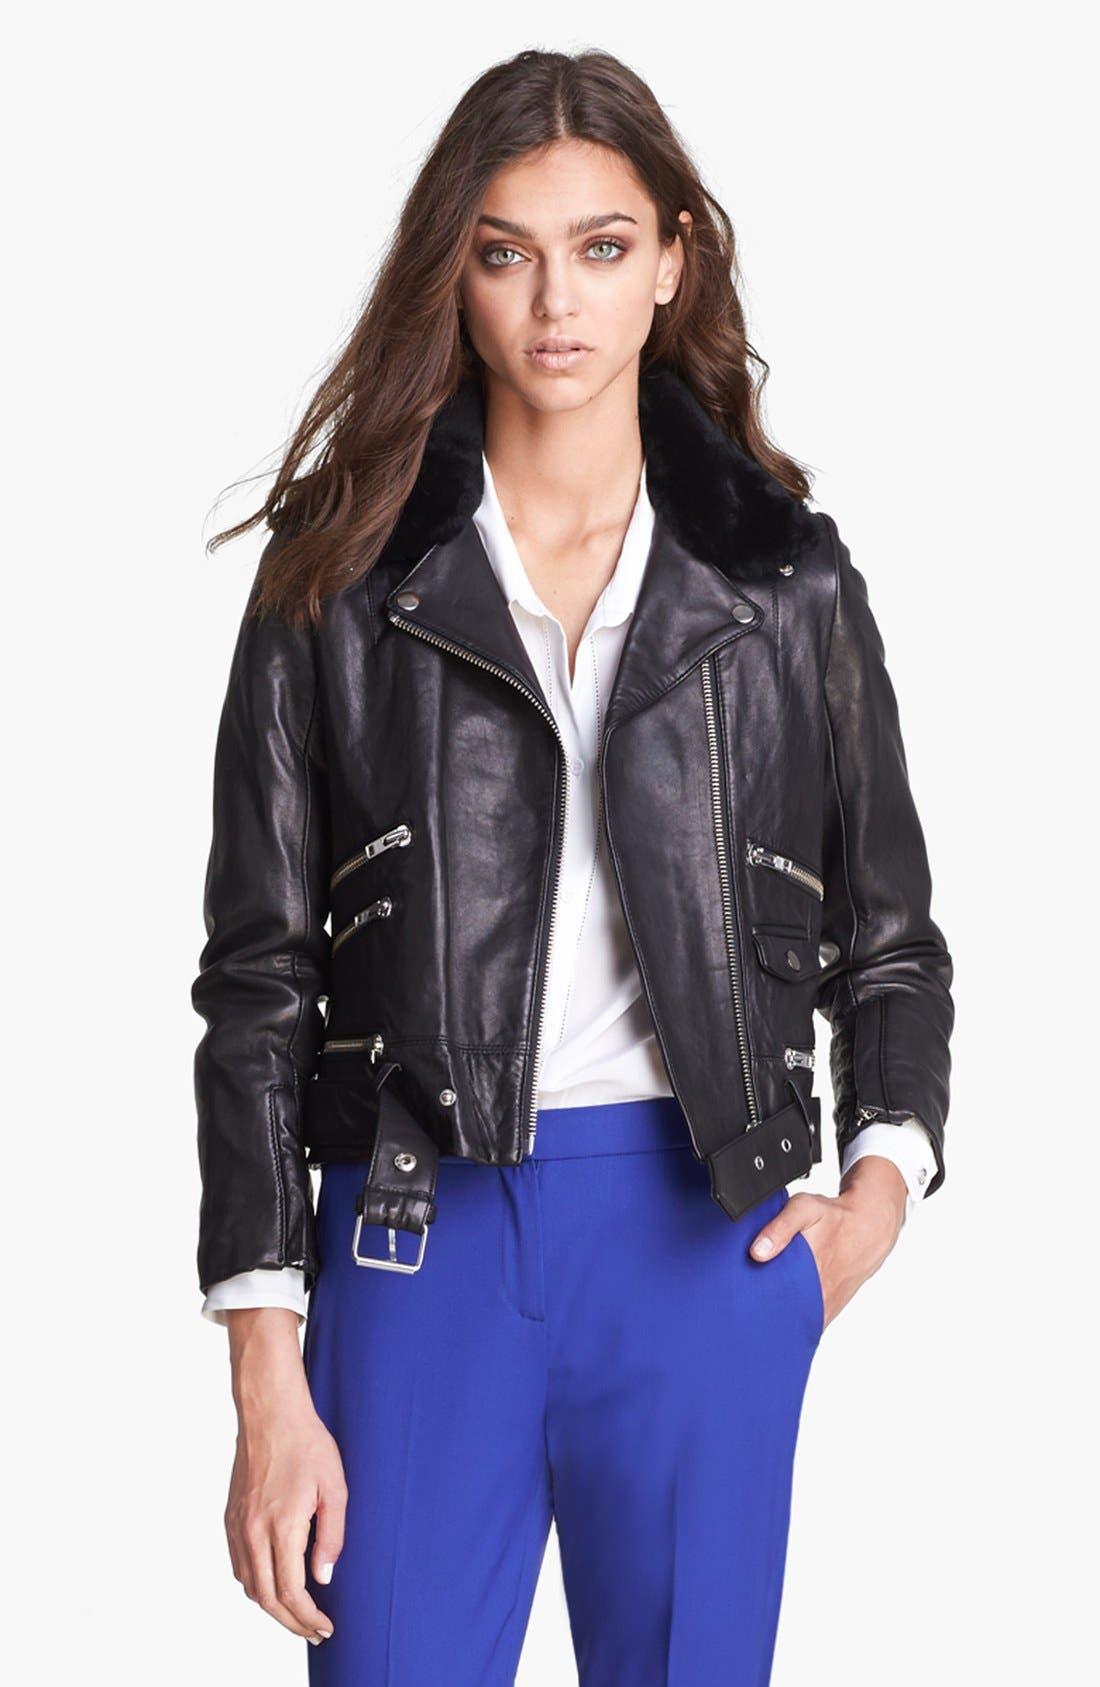 Alternate Image 1 Selected - The Kooples Leather Biker Jacket with Genuine Fur Collar